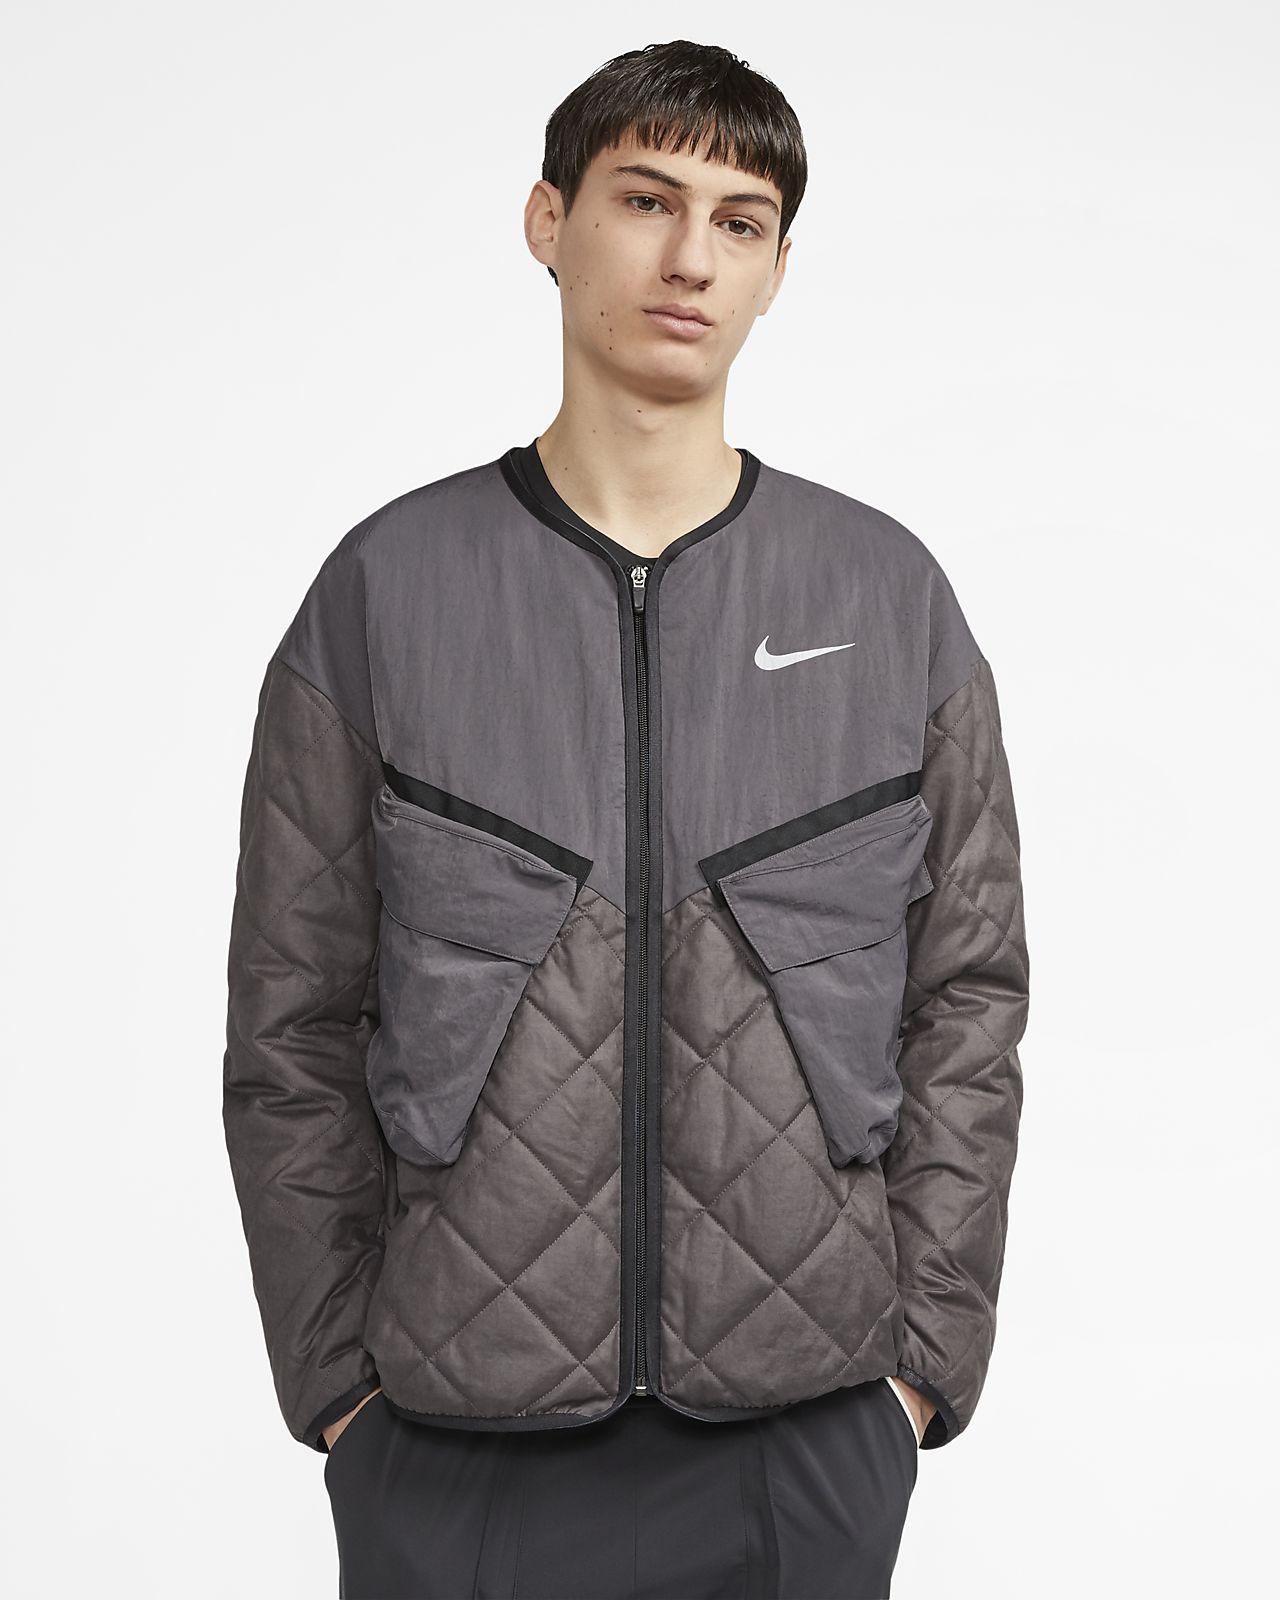 Nike Run Ready Men's Jacket